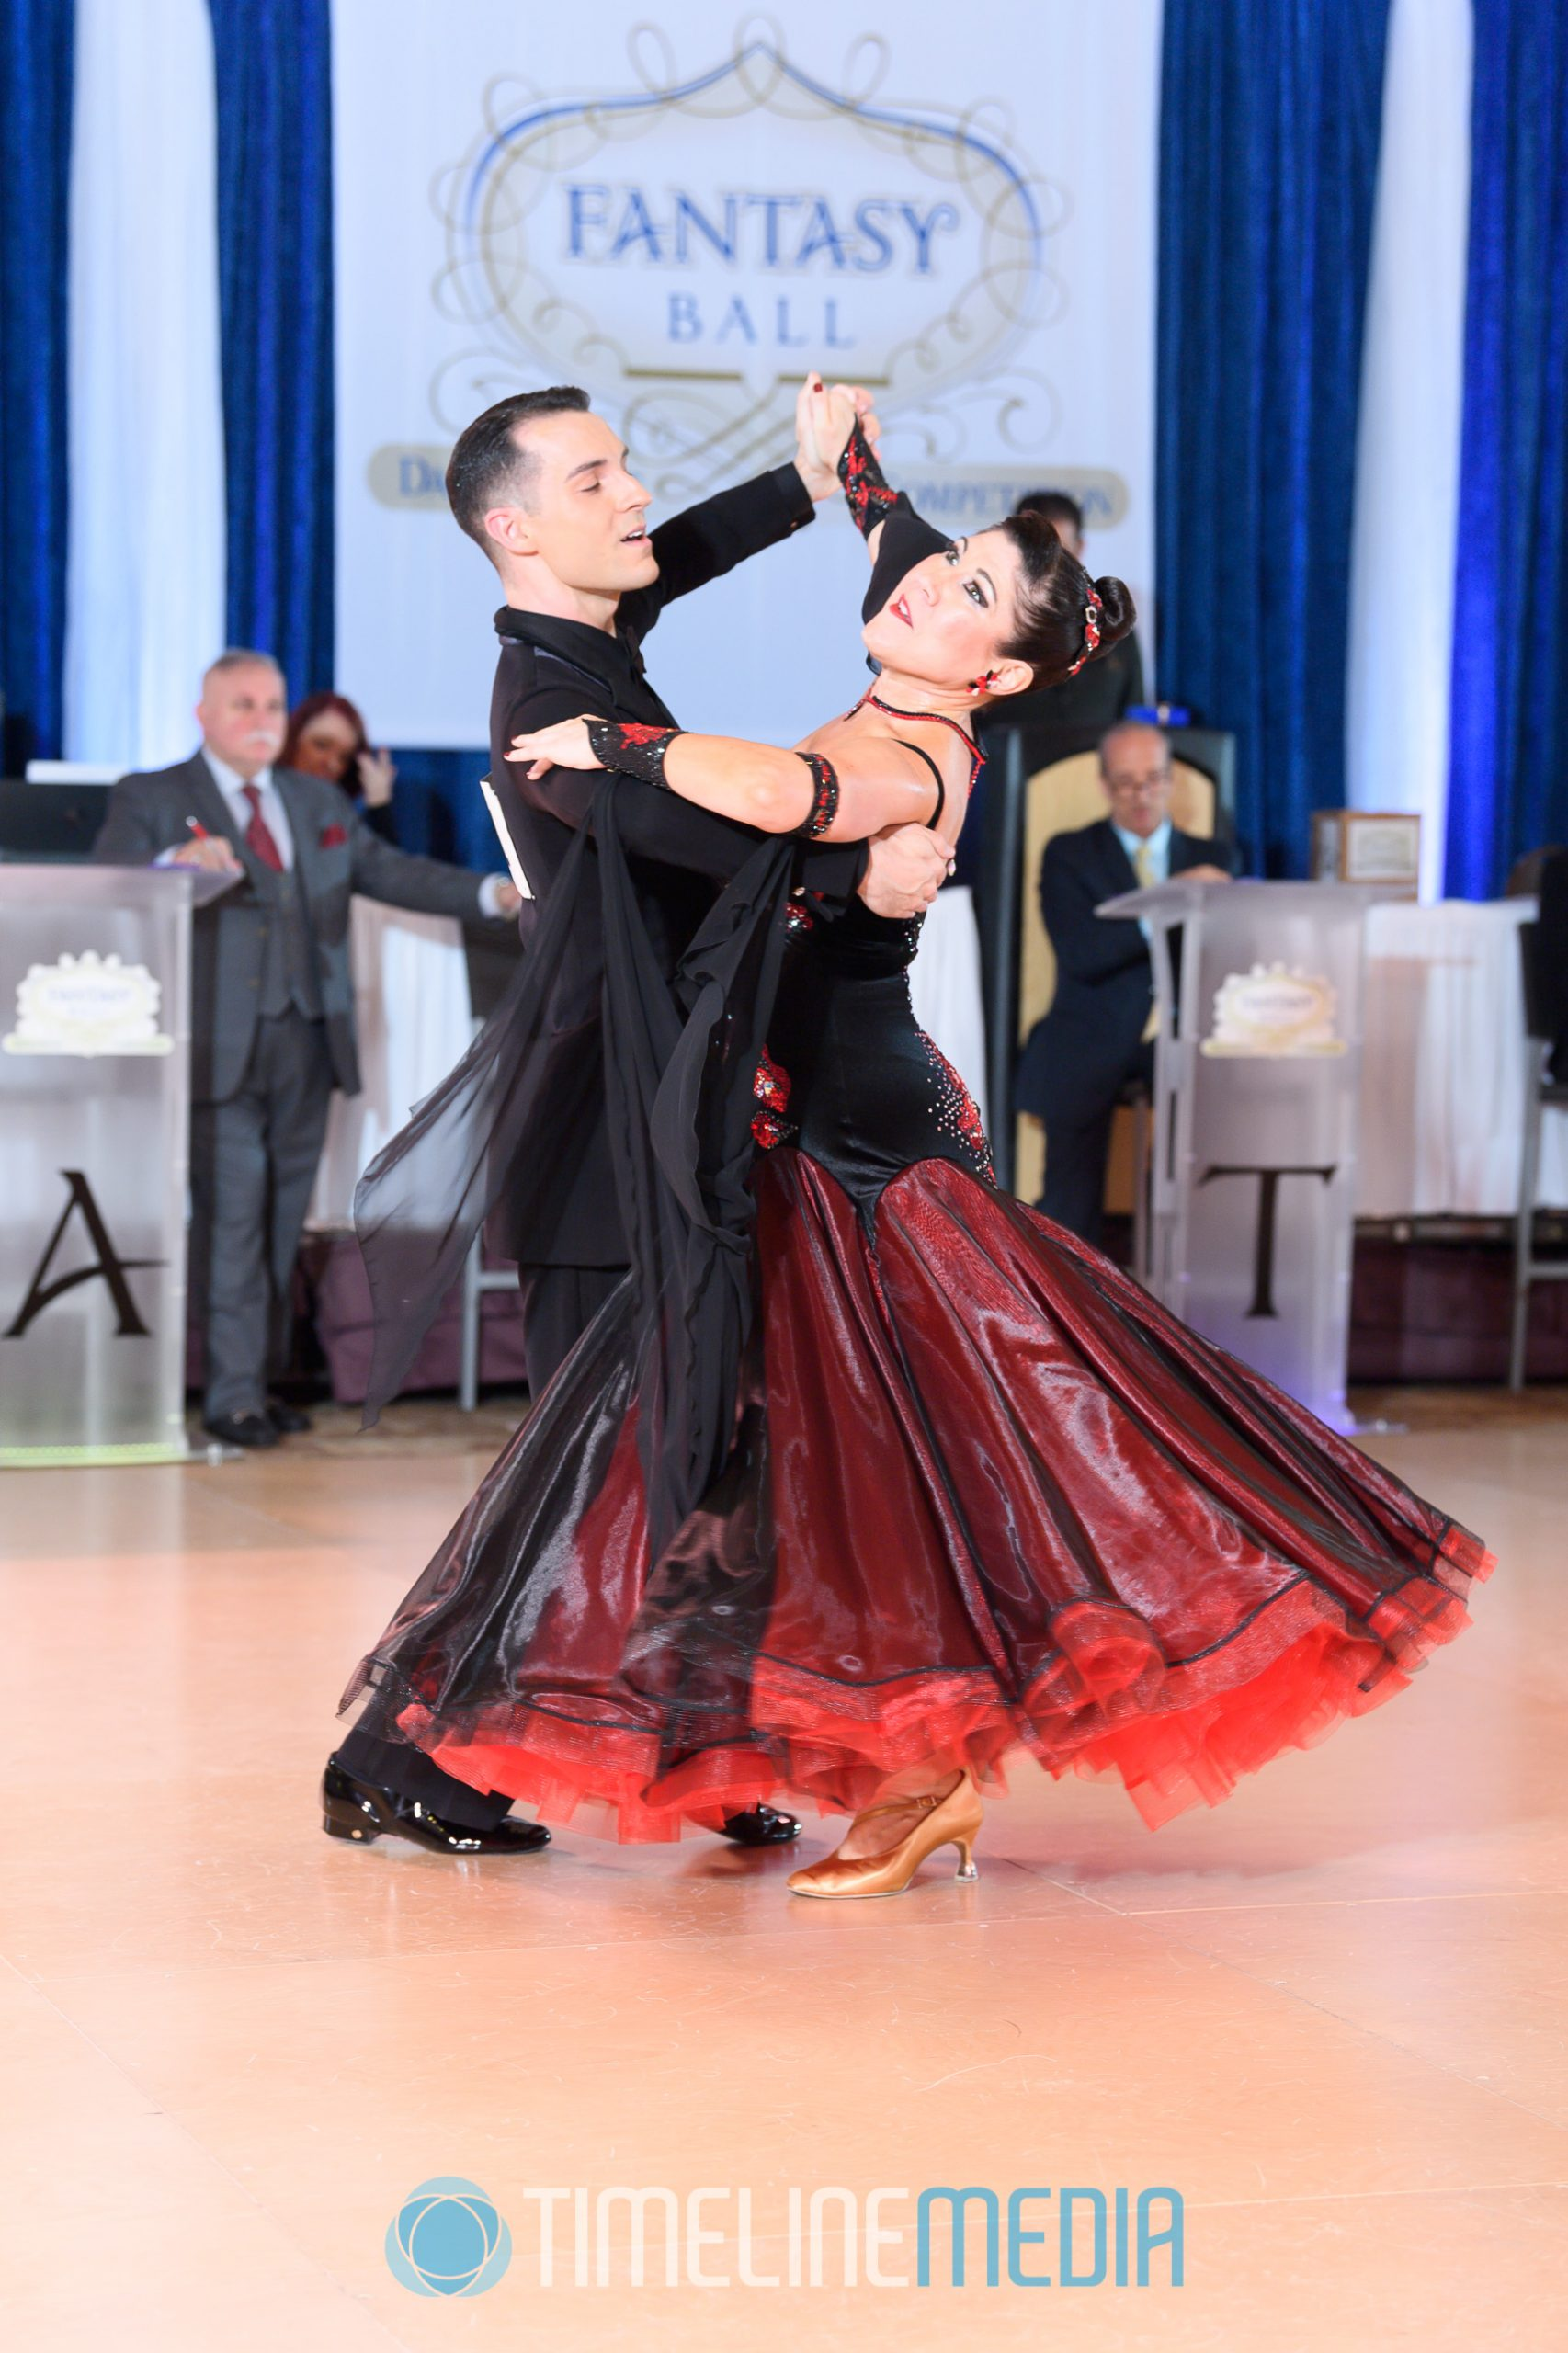 Standard dancers at the 2019 Fantasy Ball Dancesport Competition ©TimeLine Media